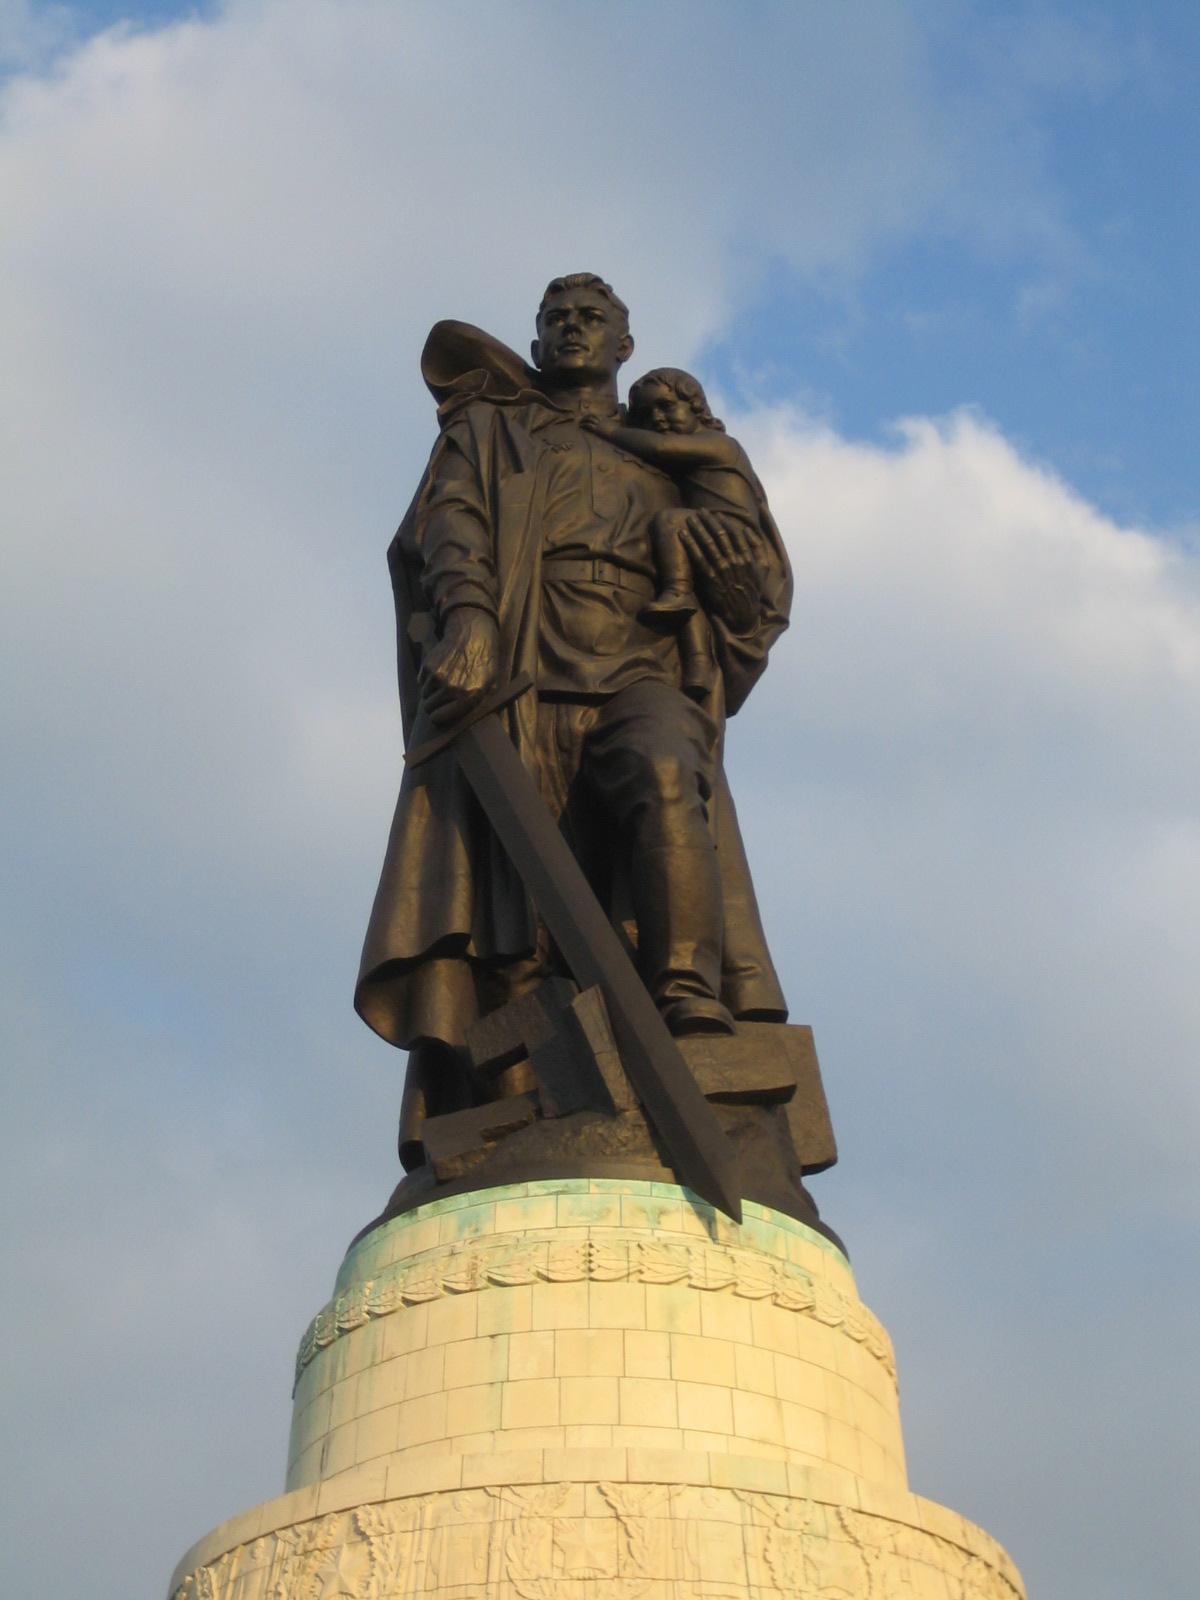 sowjetisches ehrenmal im treptower park wikipedia. Black Bedroom Furniture Sets. Home Design Ideas